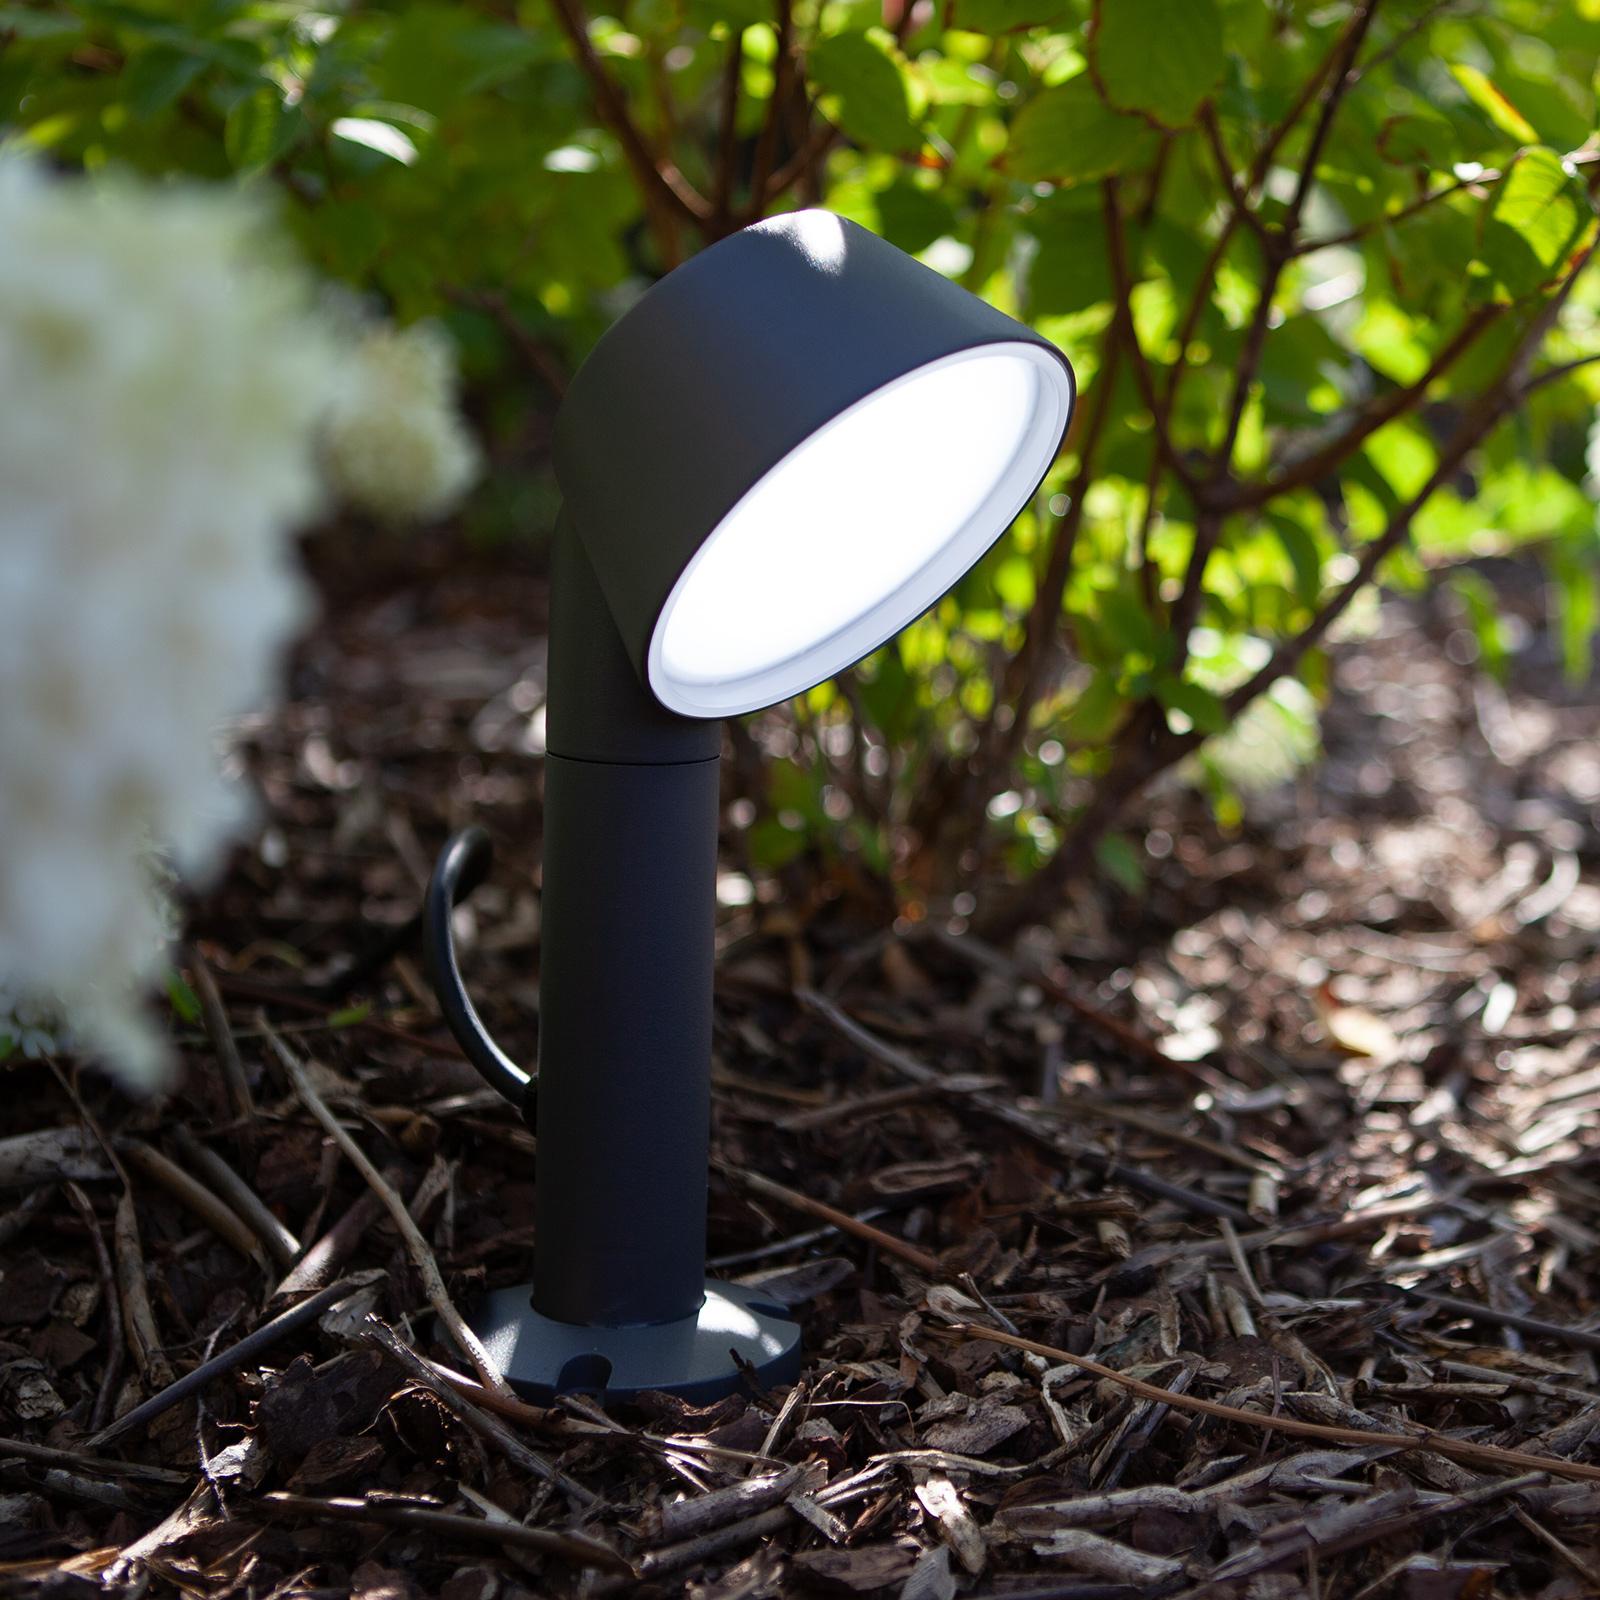 LED-Erdspießleuchte Dakota mit Tuya-Technologie